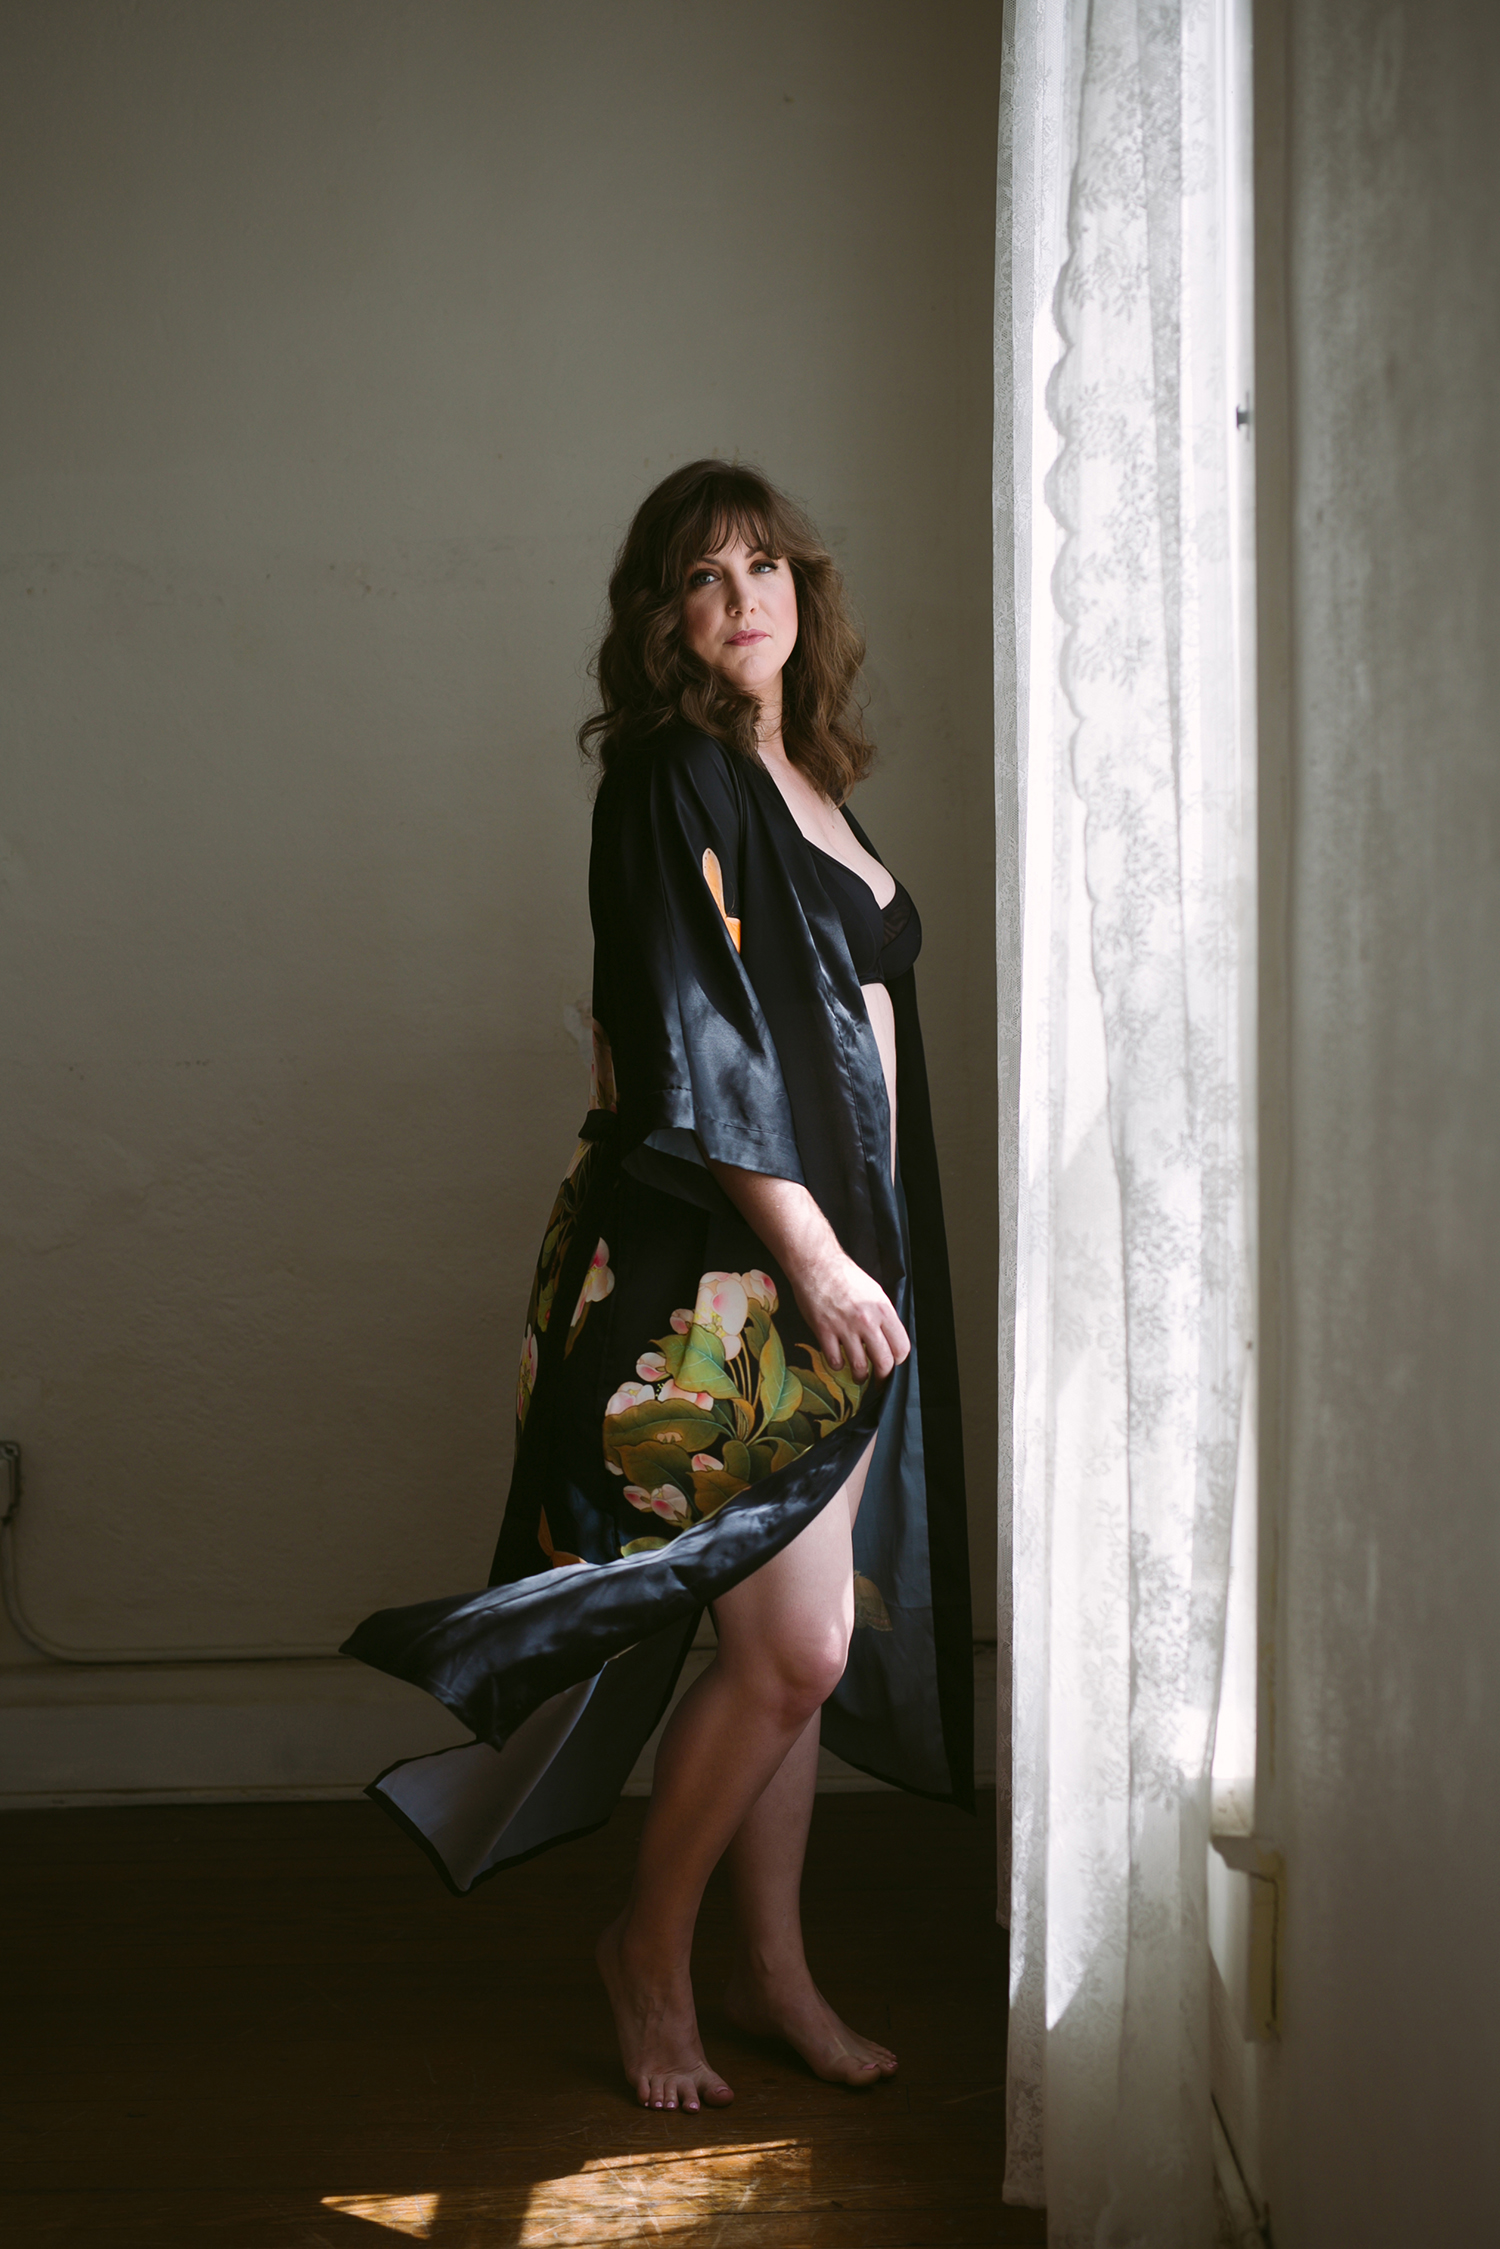 austin-texas-classy-boudoir-photography-KBB10.jpg